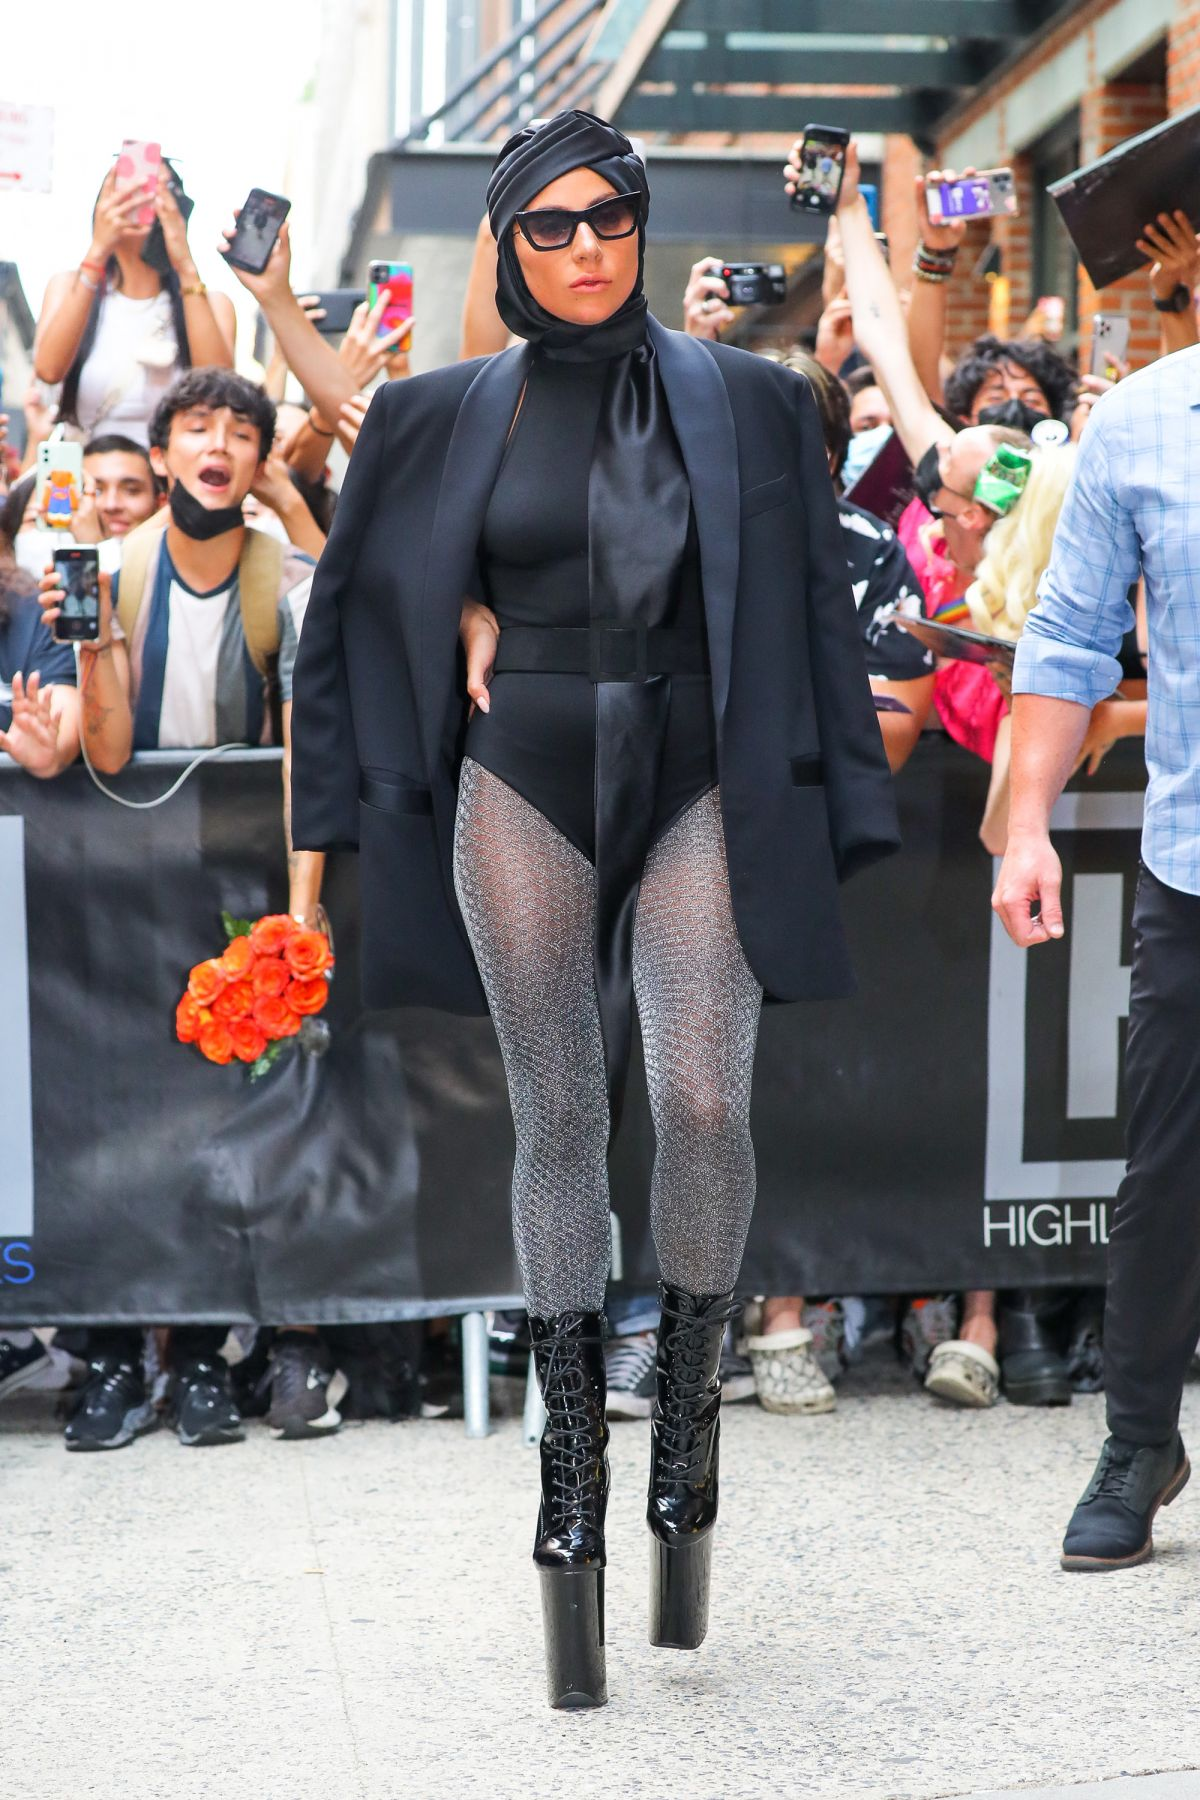 lady-gaga-leaves-milk-studios-in-new-york-07-28-2021-1